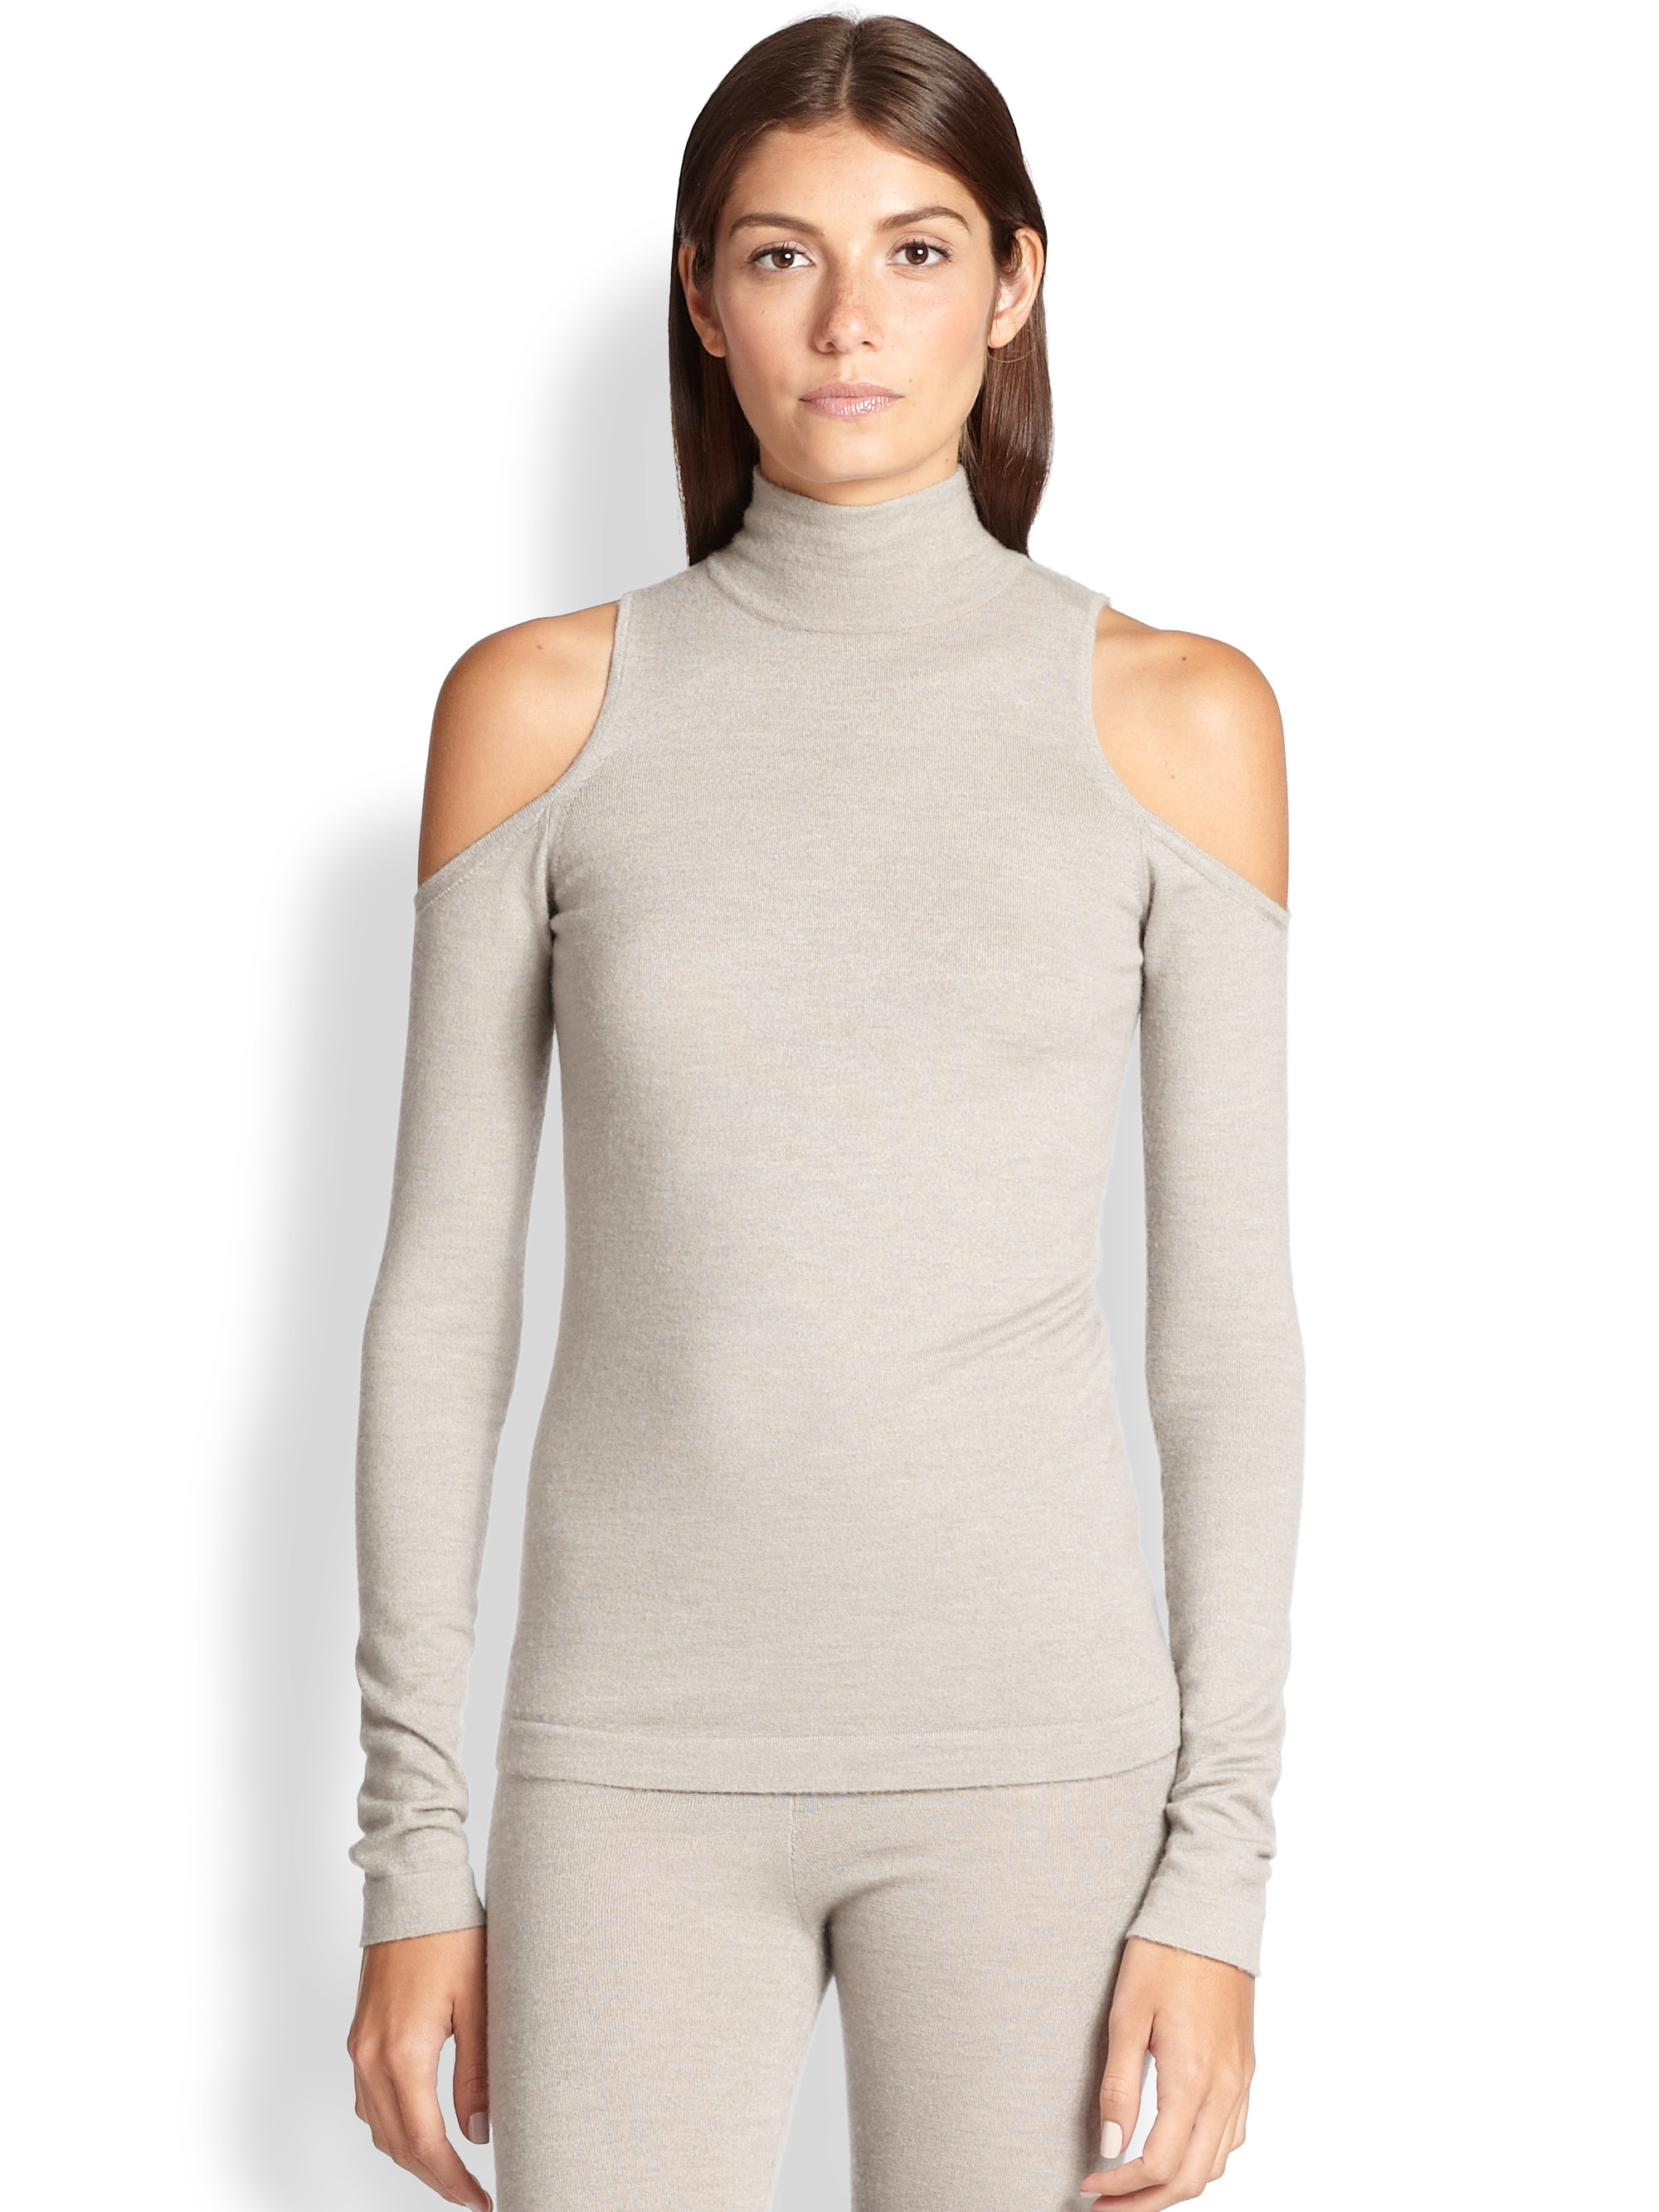 Turtleneck Sweater Womens